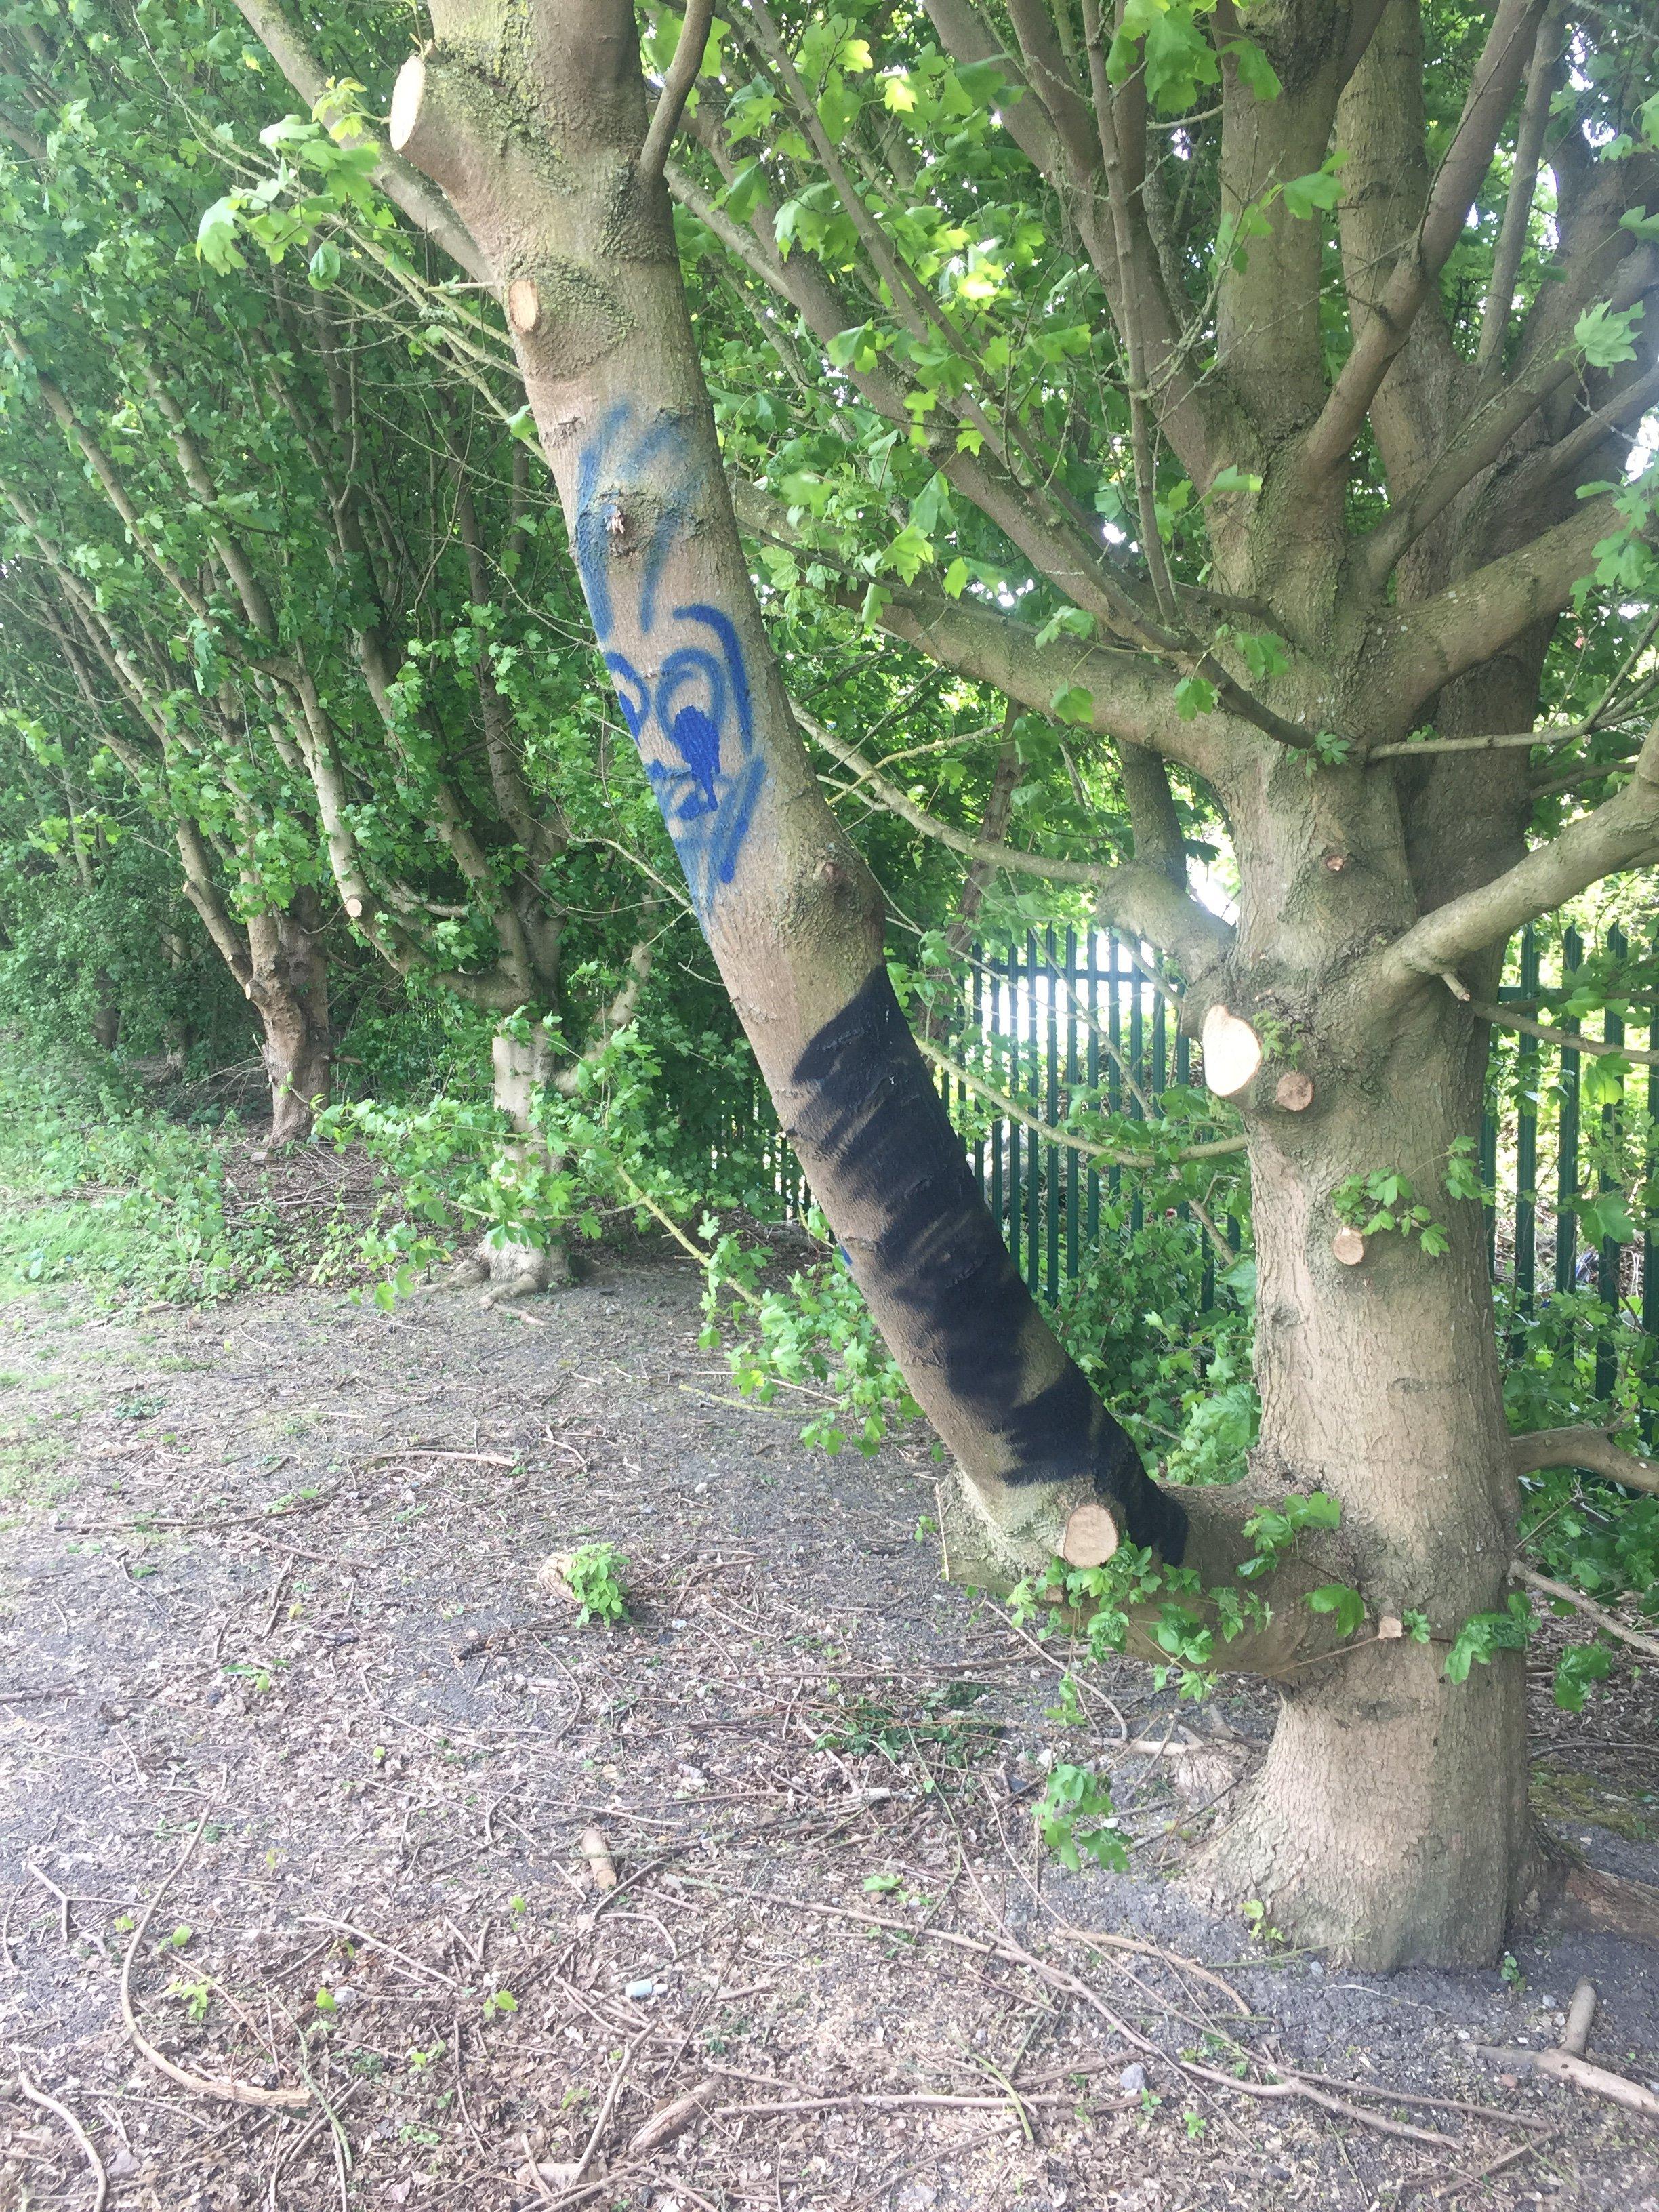 graffiti removal on a tree